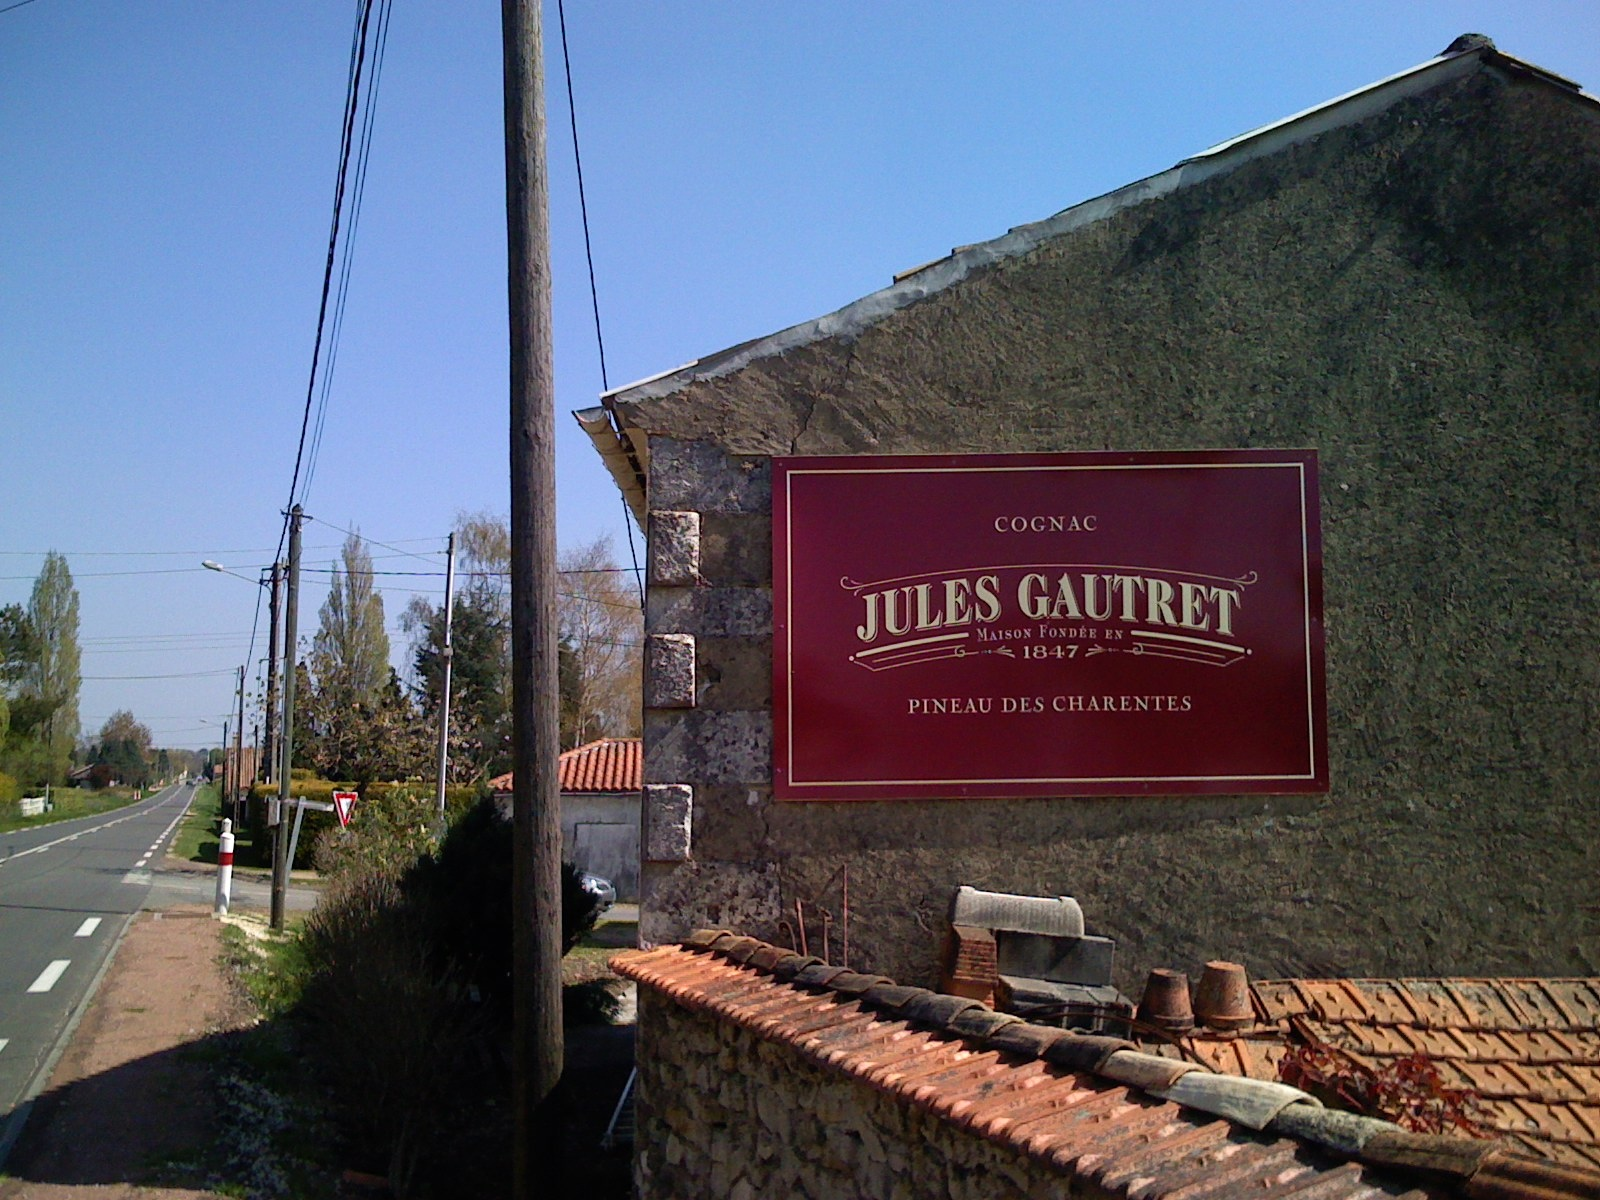 Jules Gautret Cognac sign Charente, France